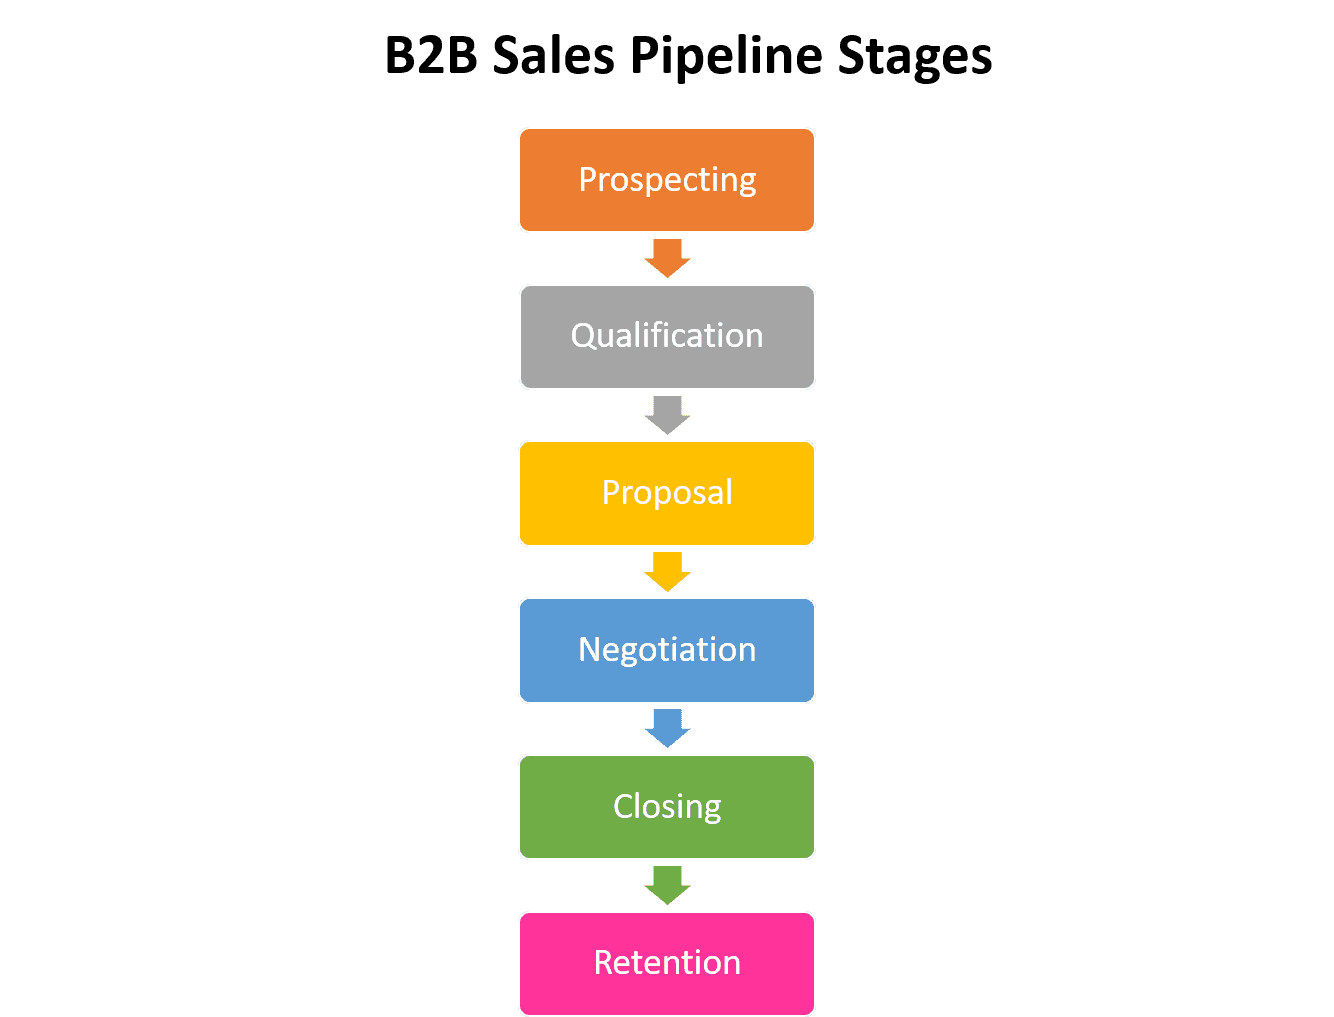 b2b sales pipeline stages